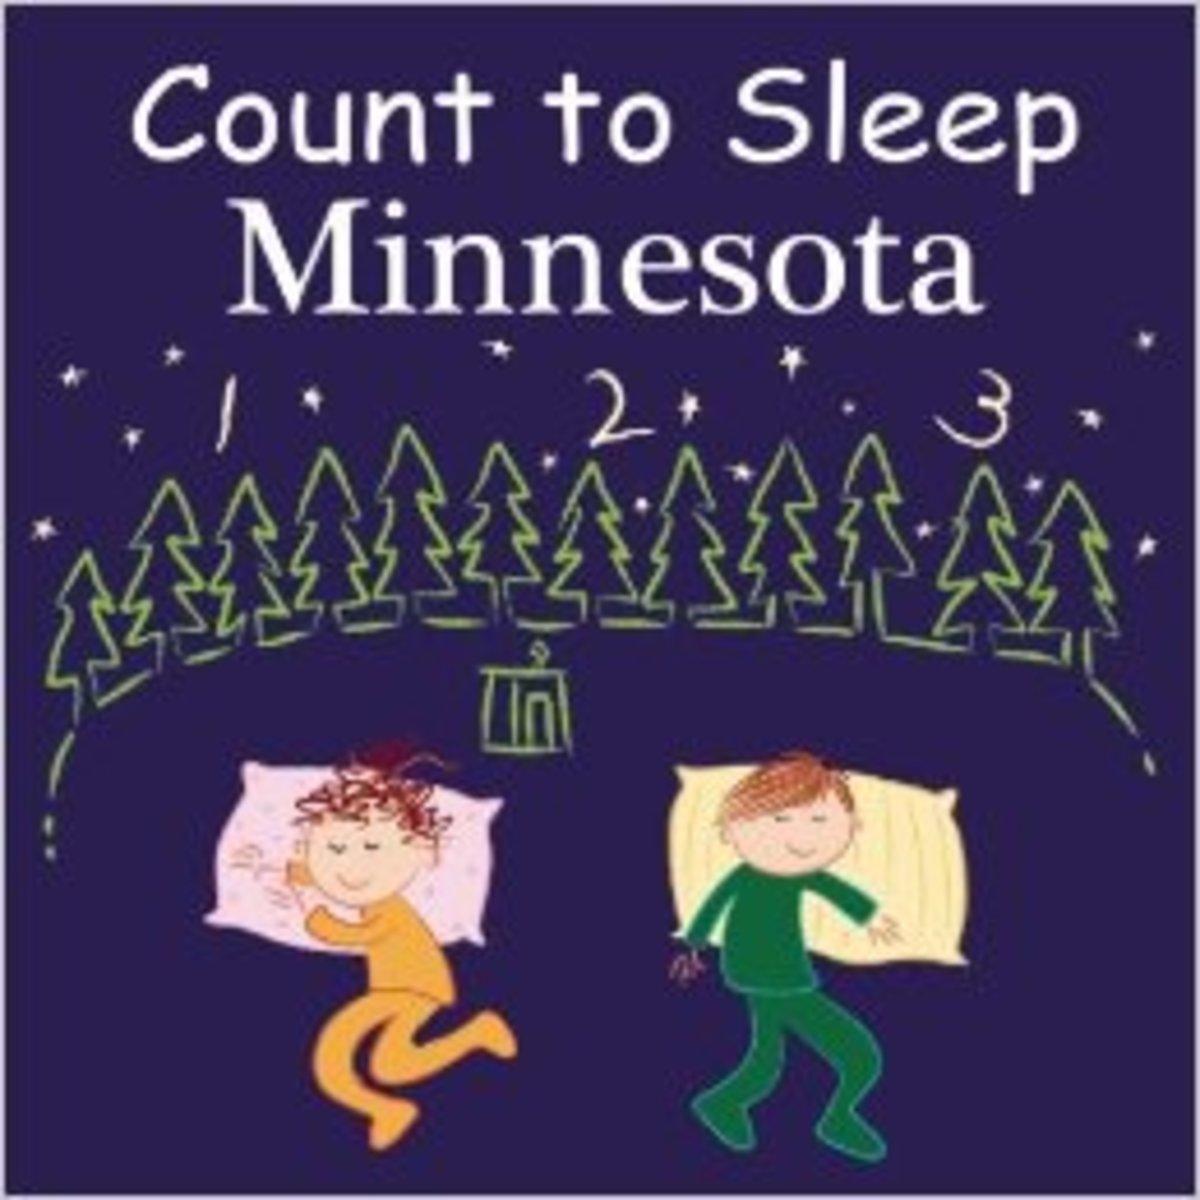 Count To Sleep Minnesota Board book by Adam Gamble